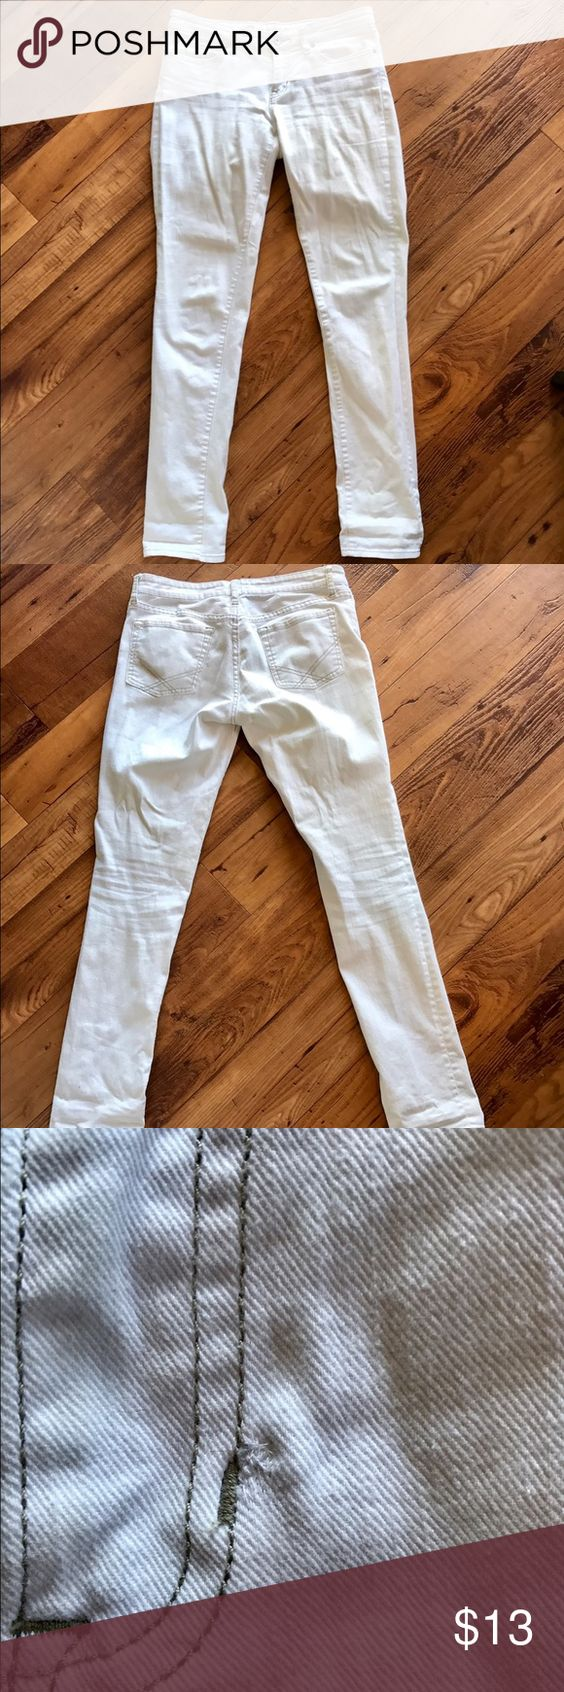 GAP White Skinny Jeans - Size 6